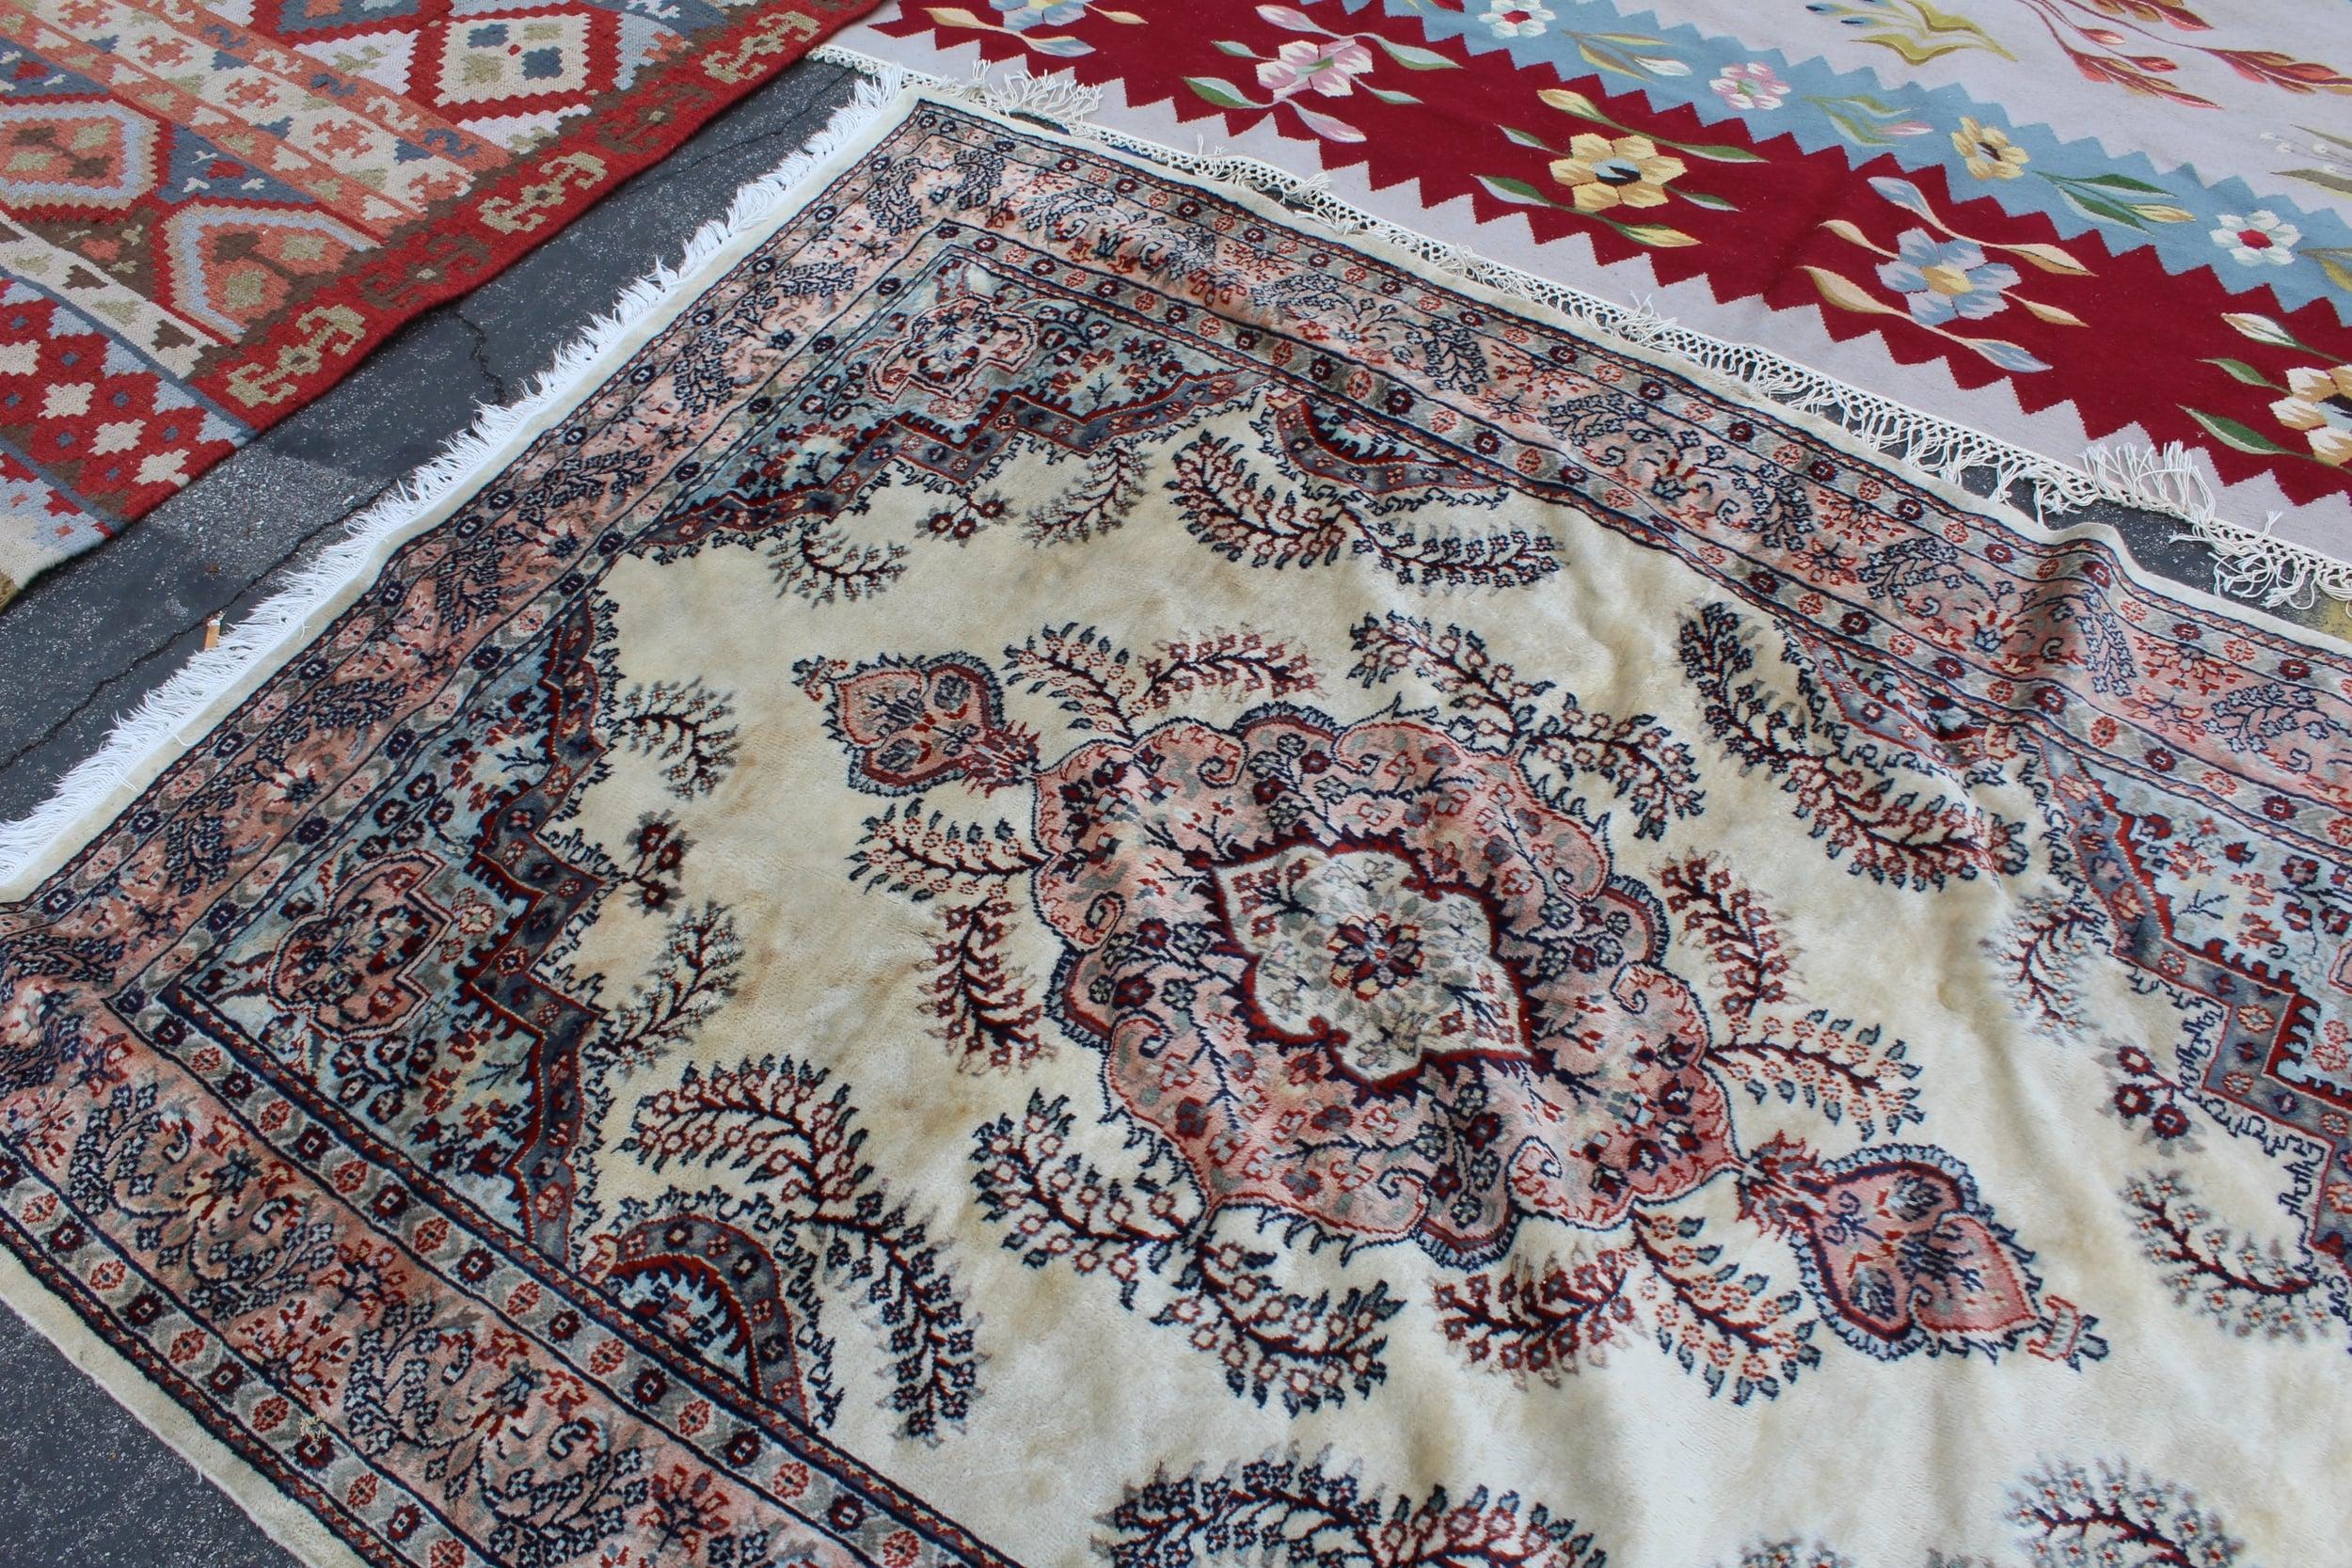 Textiles + Rugs | Rose Bowl Flea Market | Los Angeles | Interior Design | www.foundandkept.com